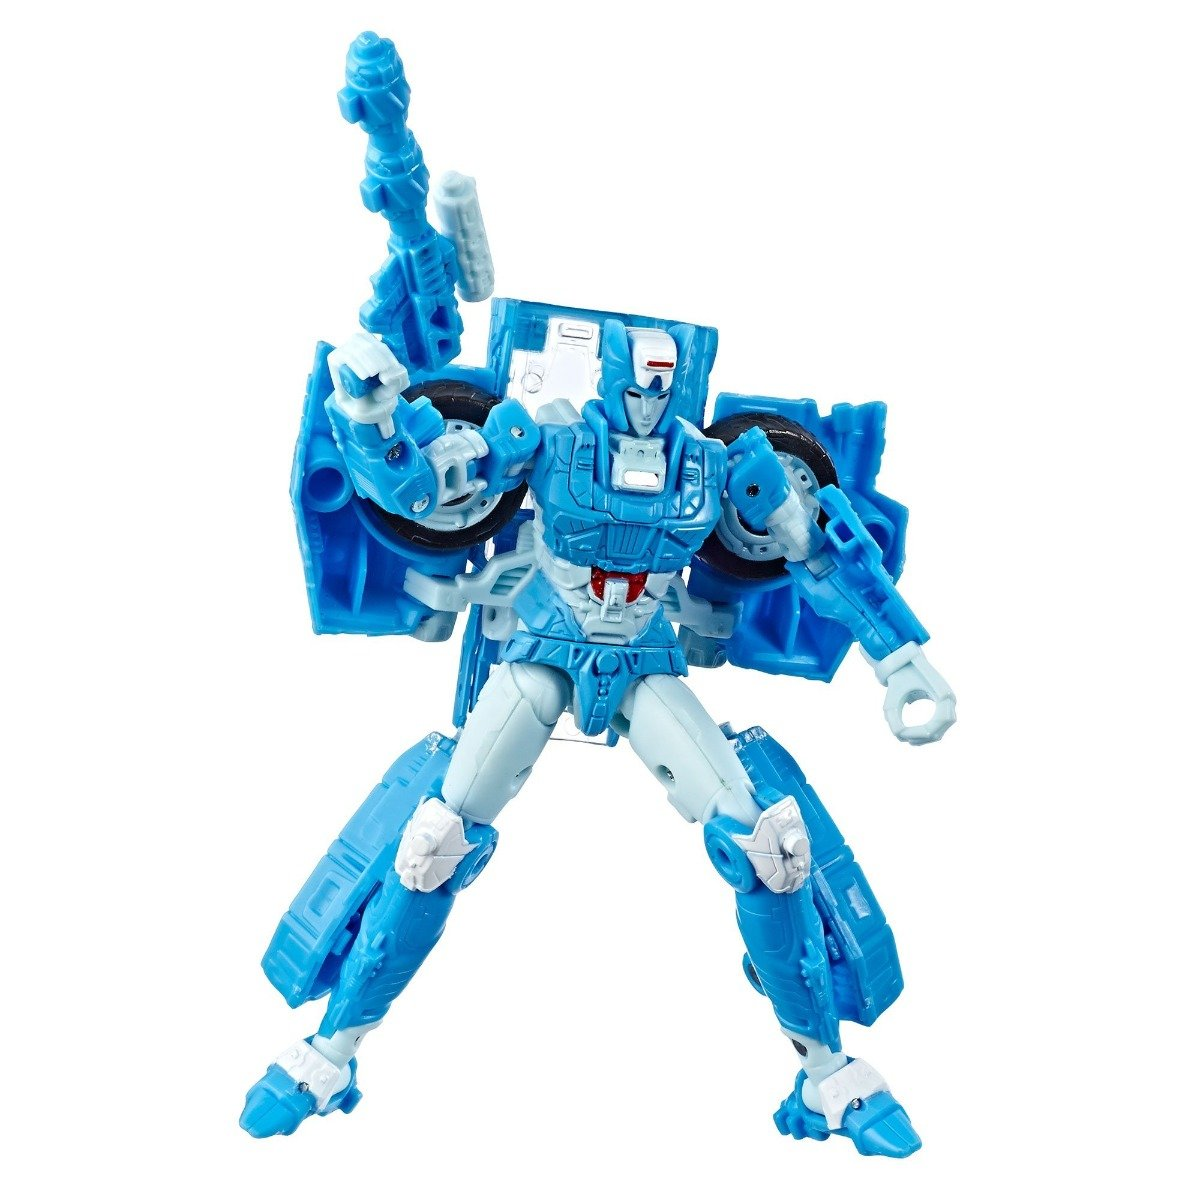 Figurina Transformers Deluxe War for Cybertron, Chromia, E3539